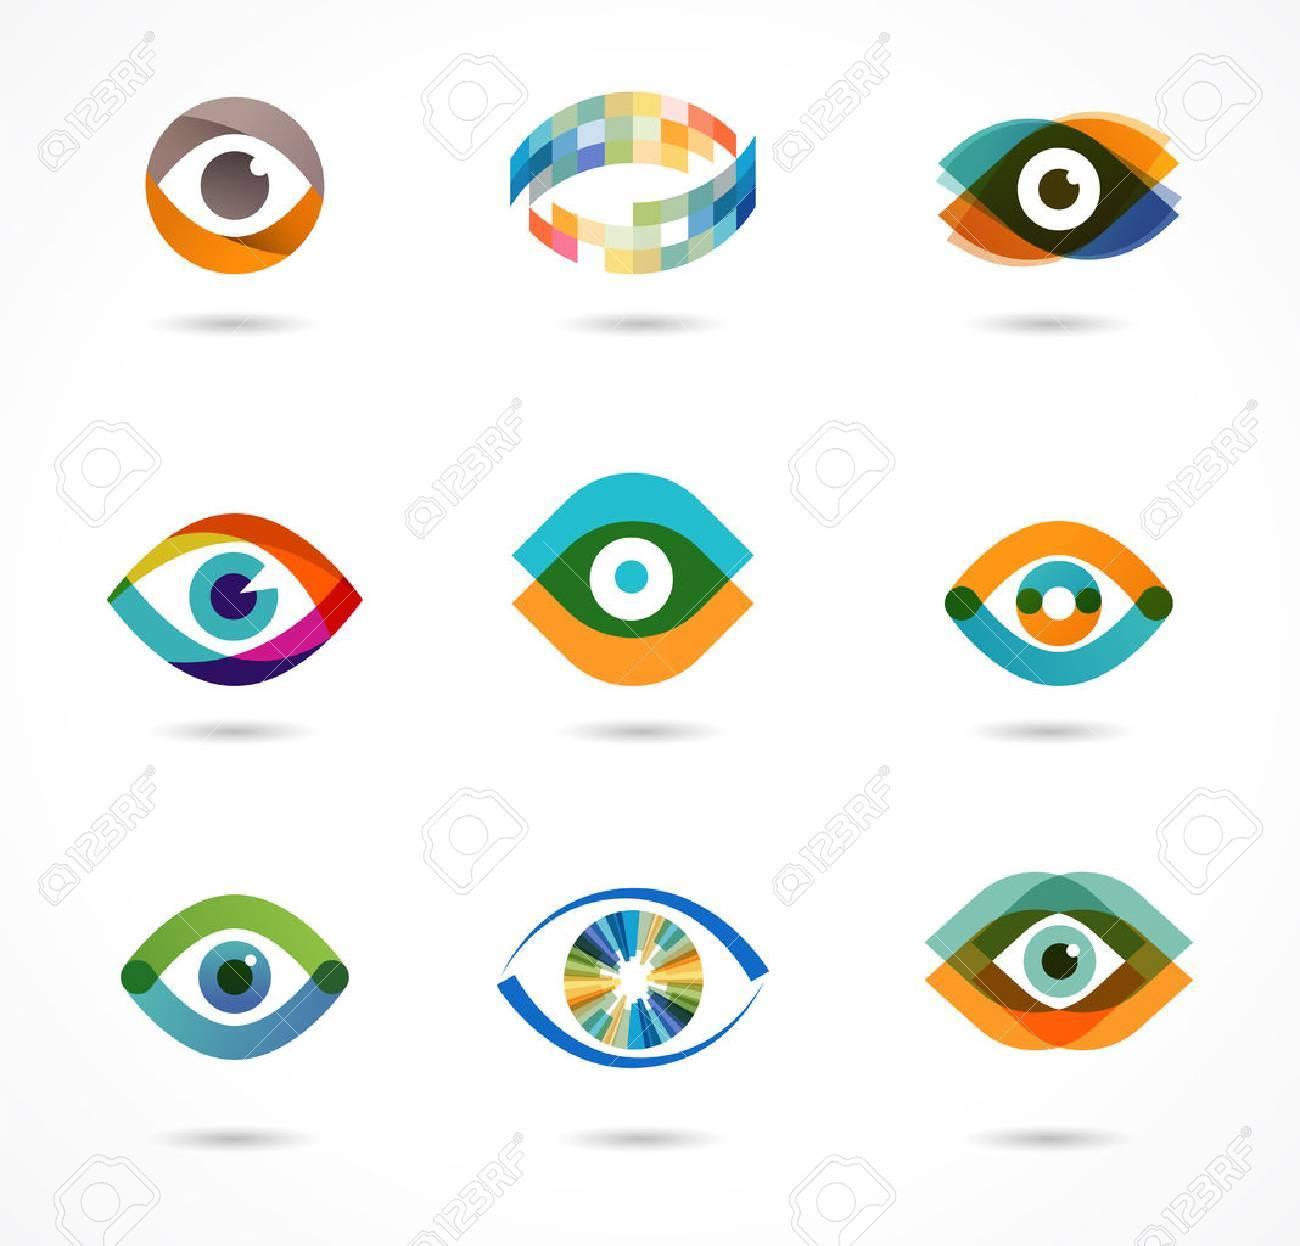 Set of colorful eye icons - 41200899